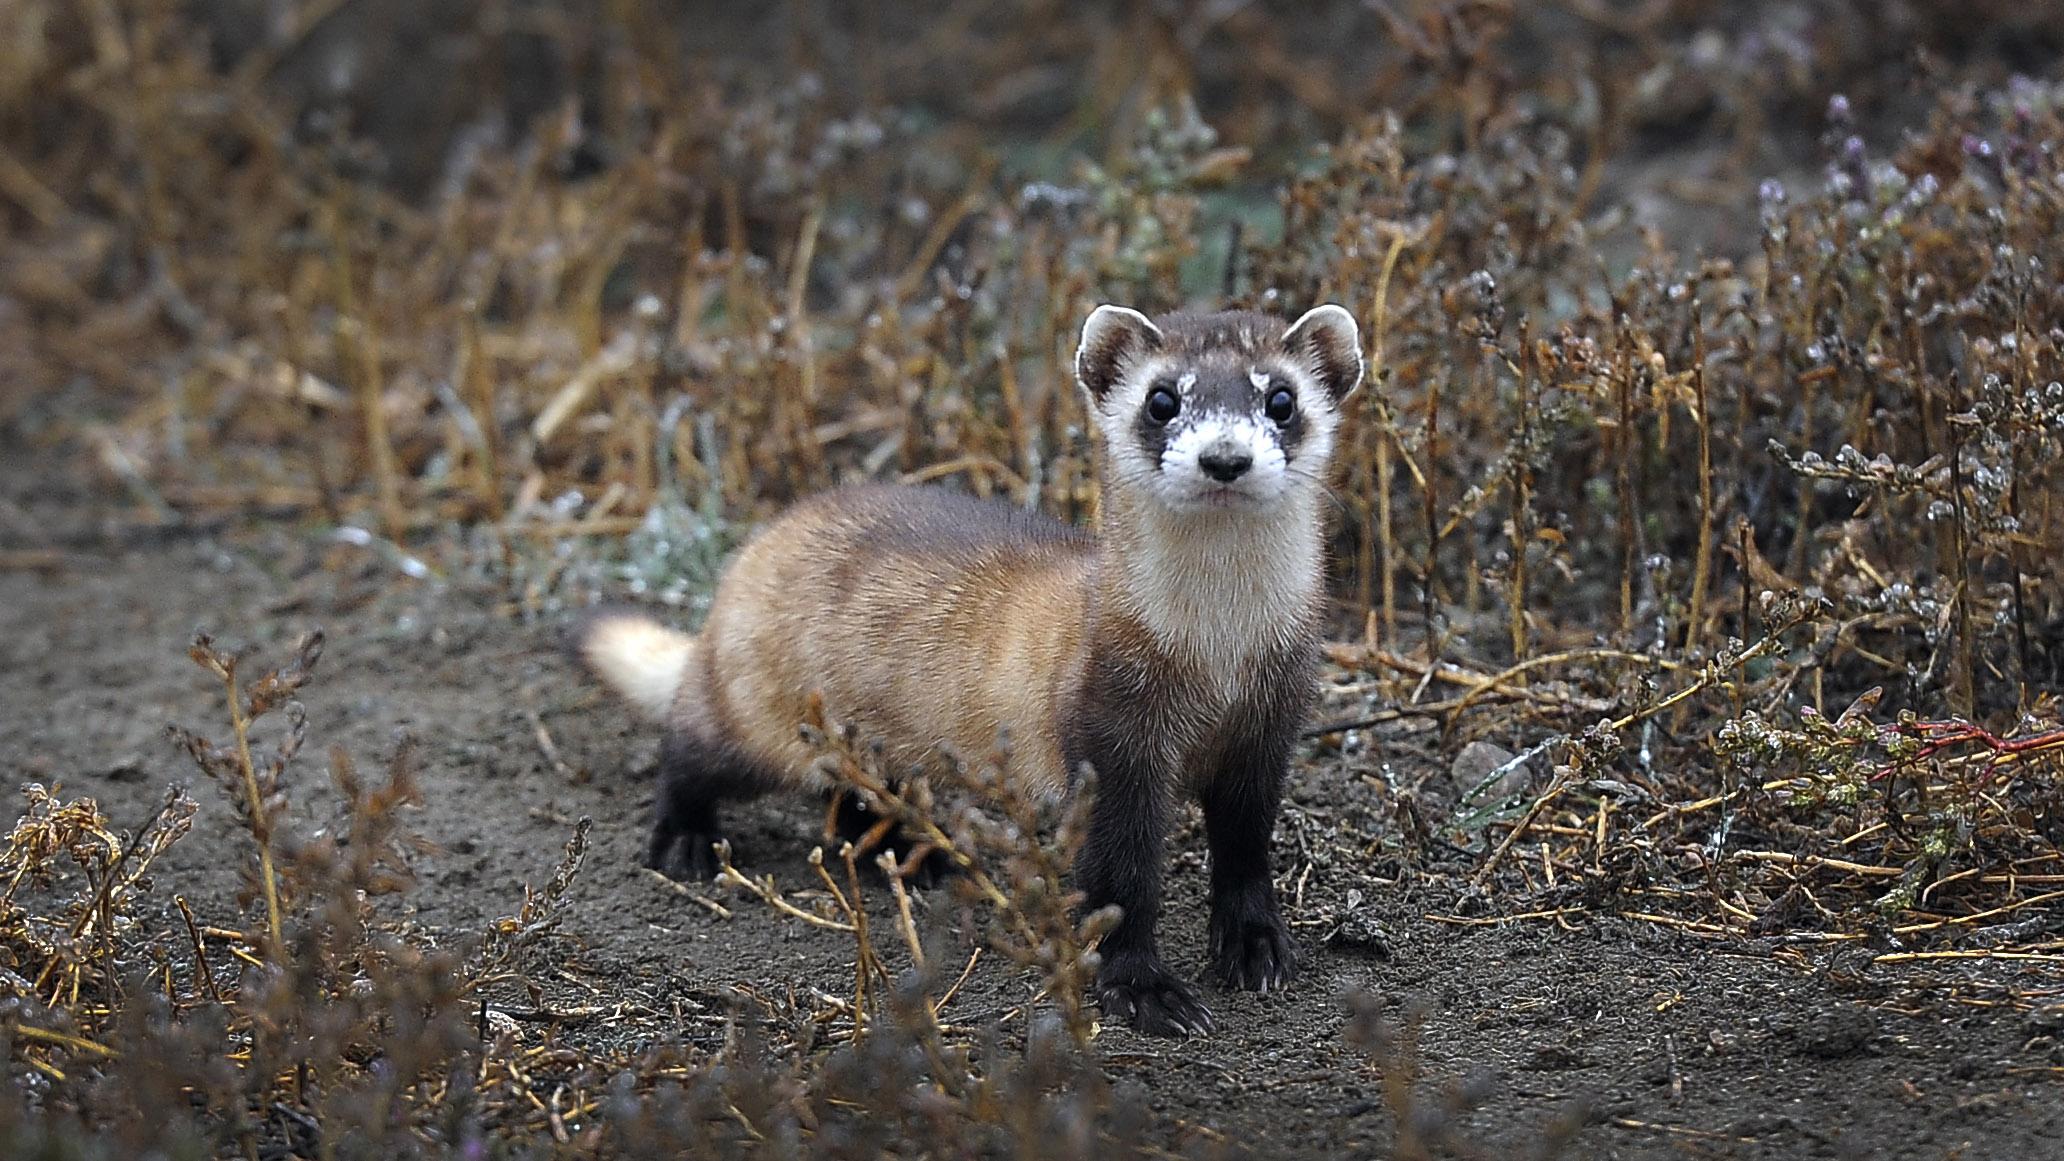 Endangered ferrets get experimental COVID-19 vaccine thumbnail